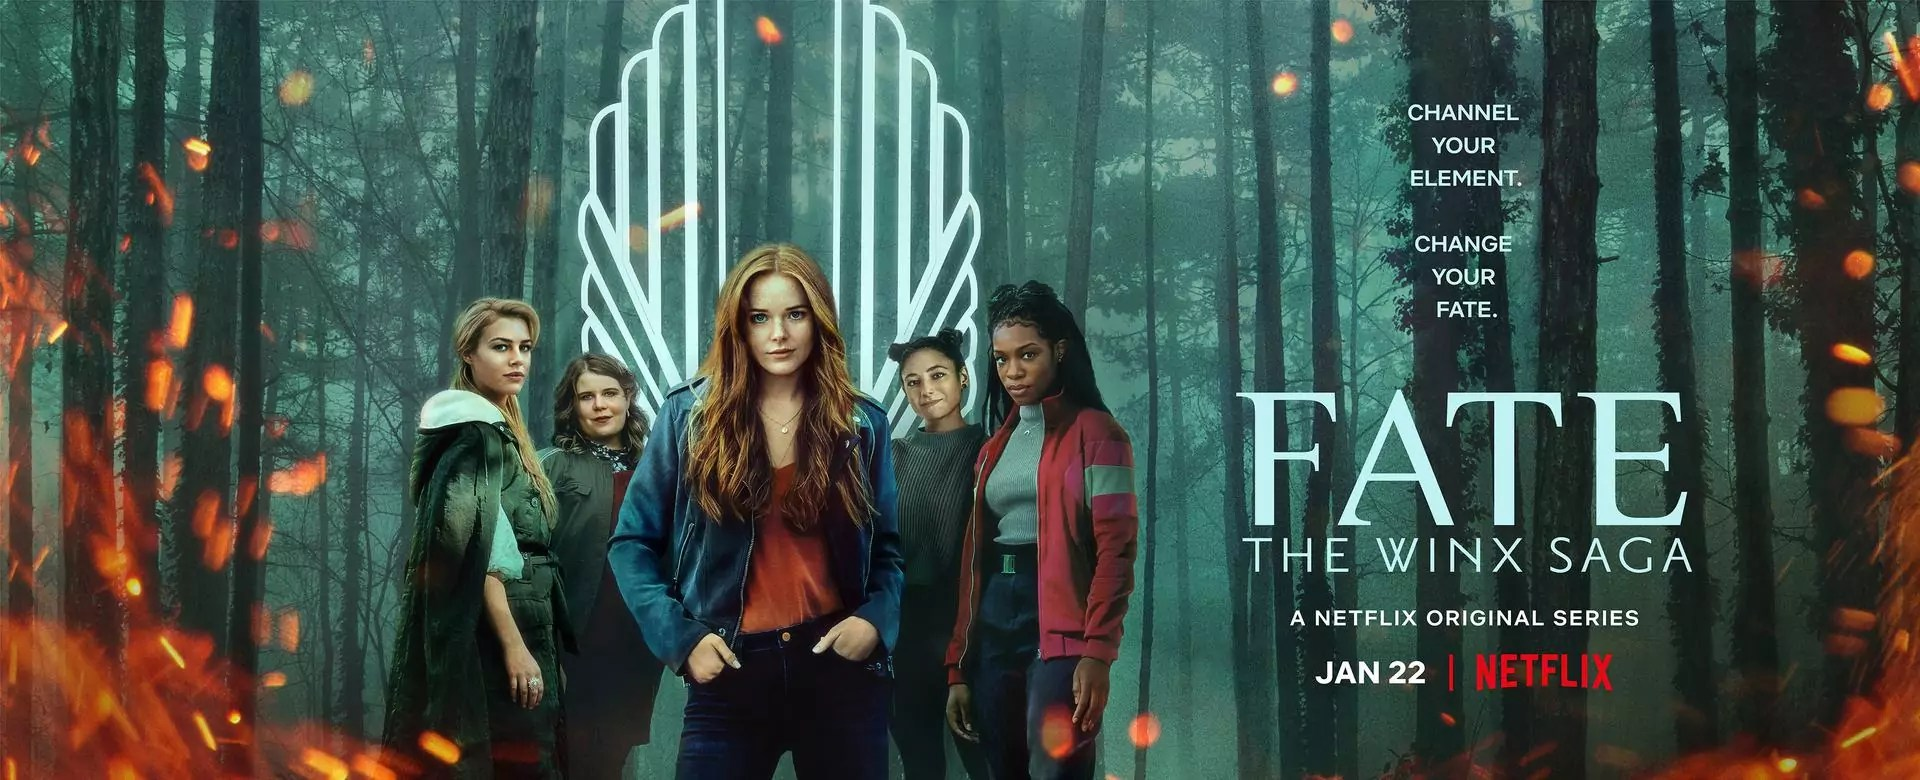 Fate-Winx-Saga-banner-op-Netflix-Belgie.